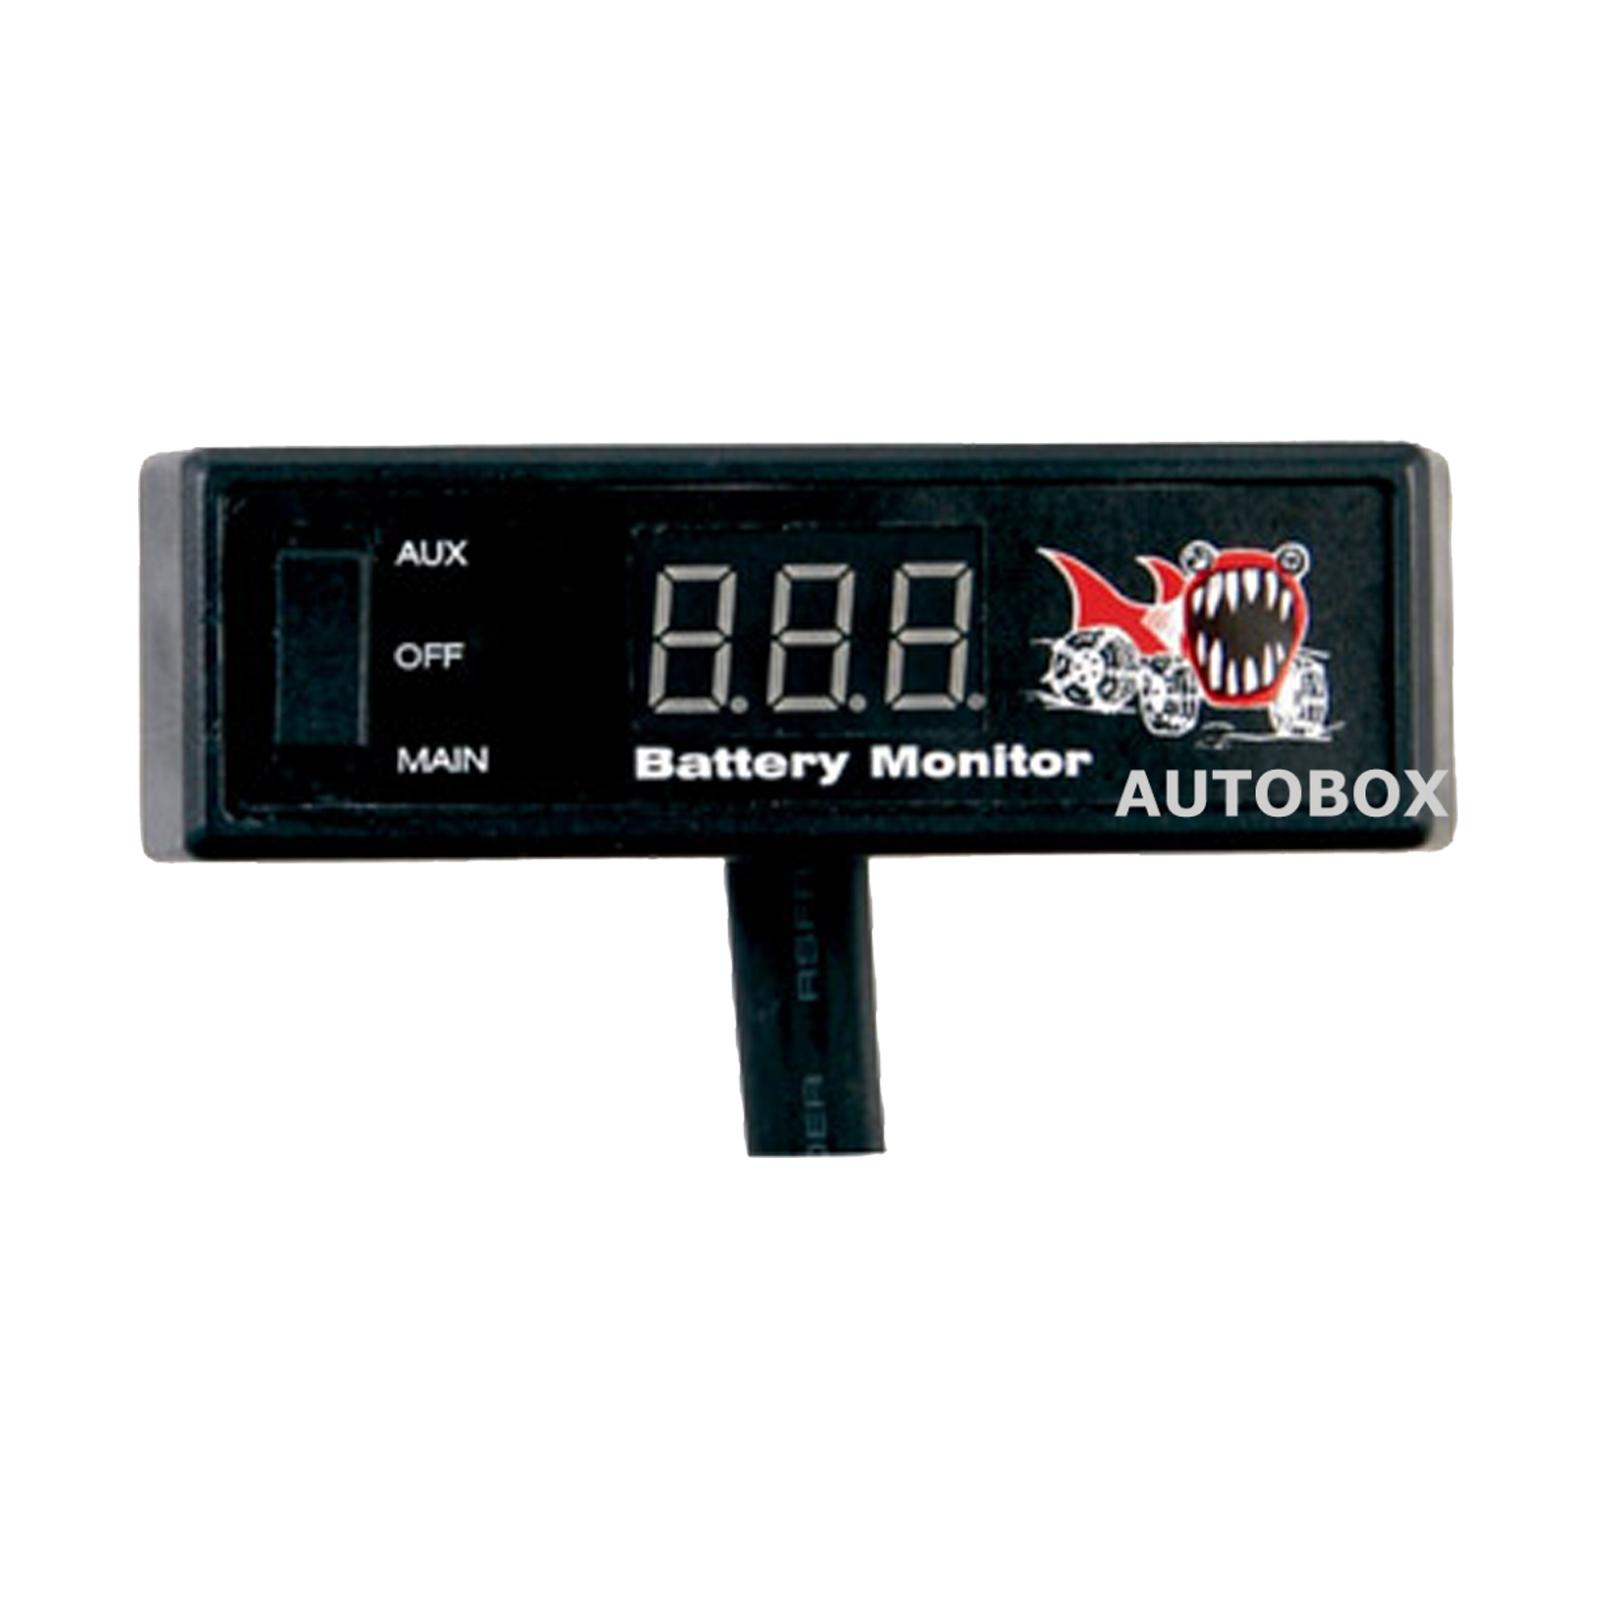 12 Volt Battery Monitoring System : Piranha dbm dual battery system monitor volt digital